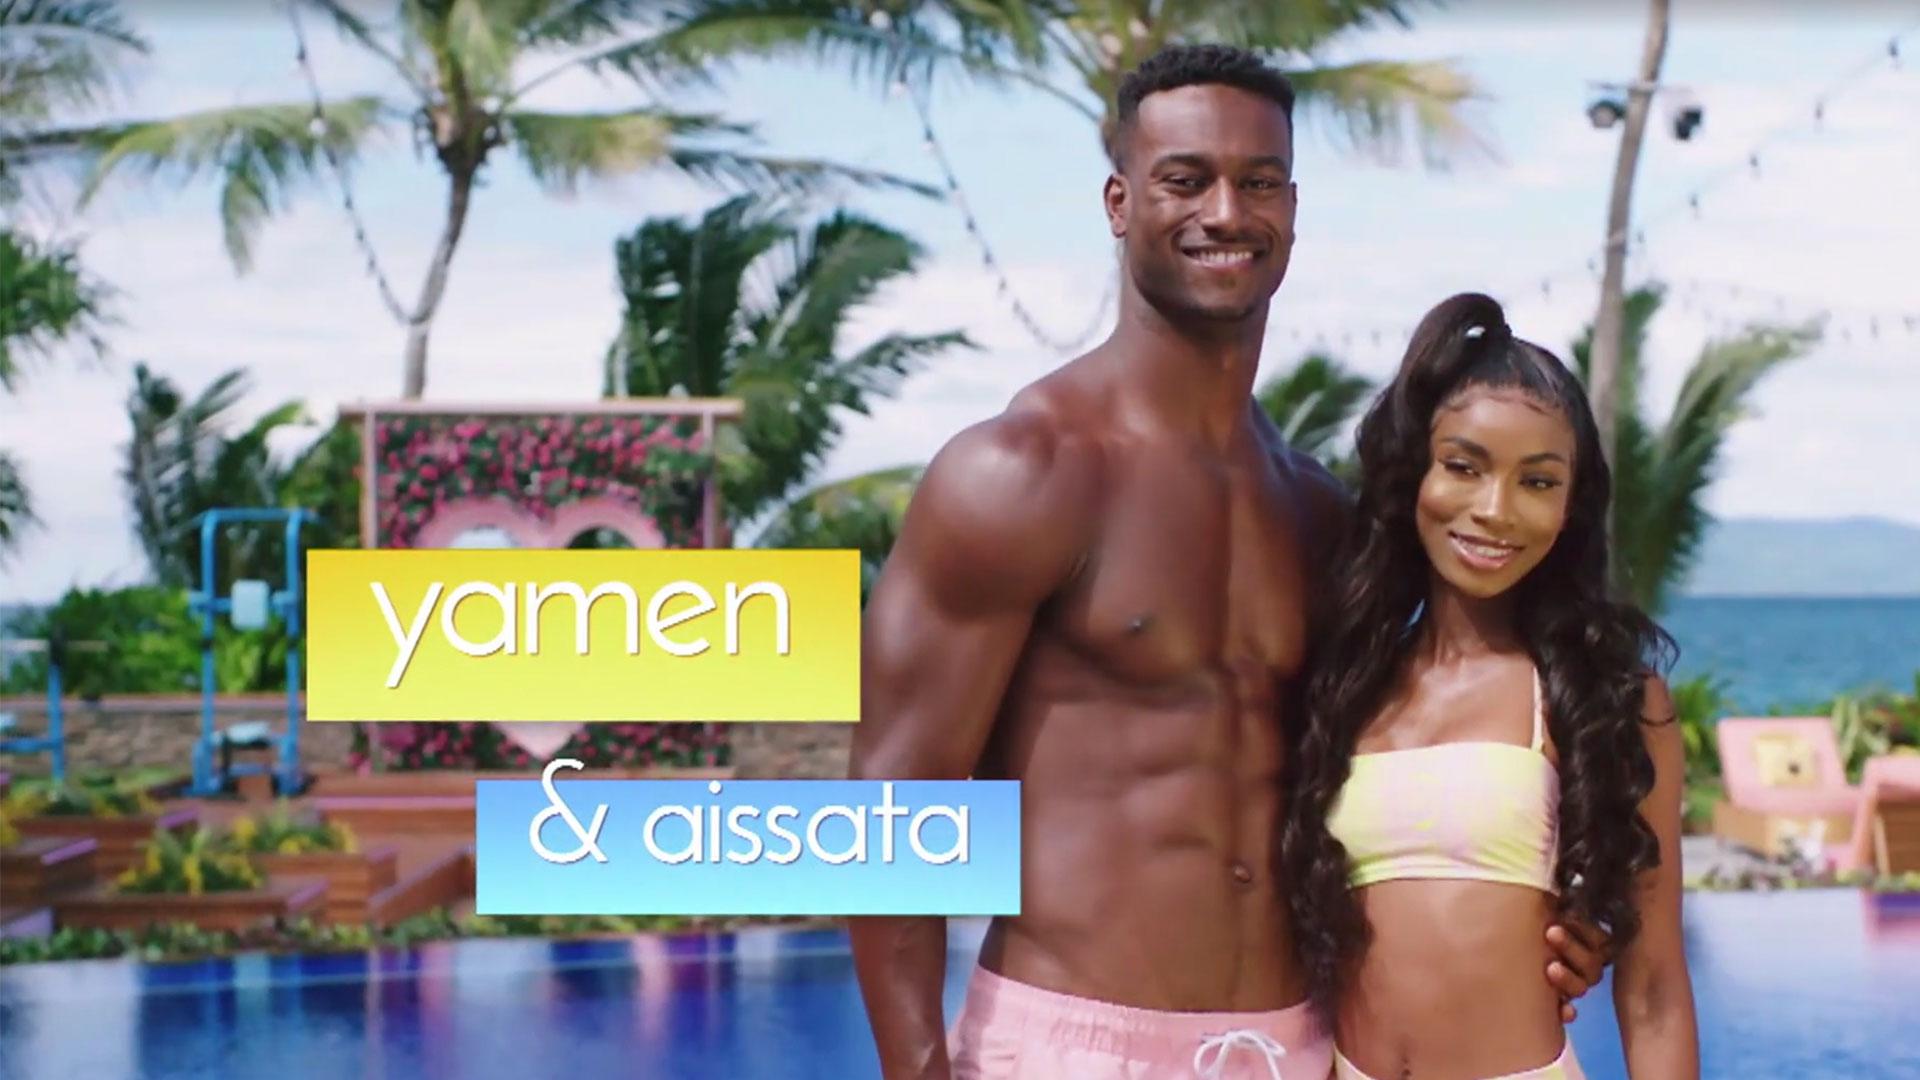 Yamen and Aissata